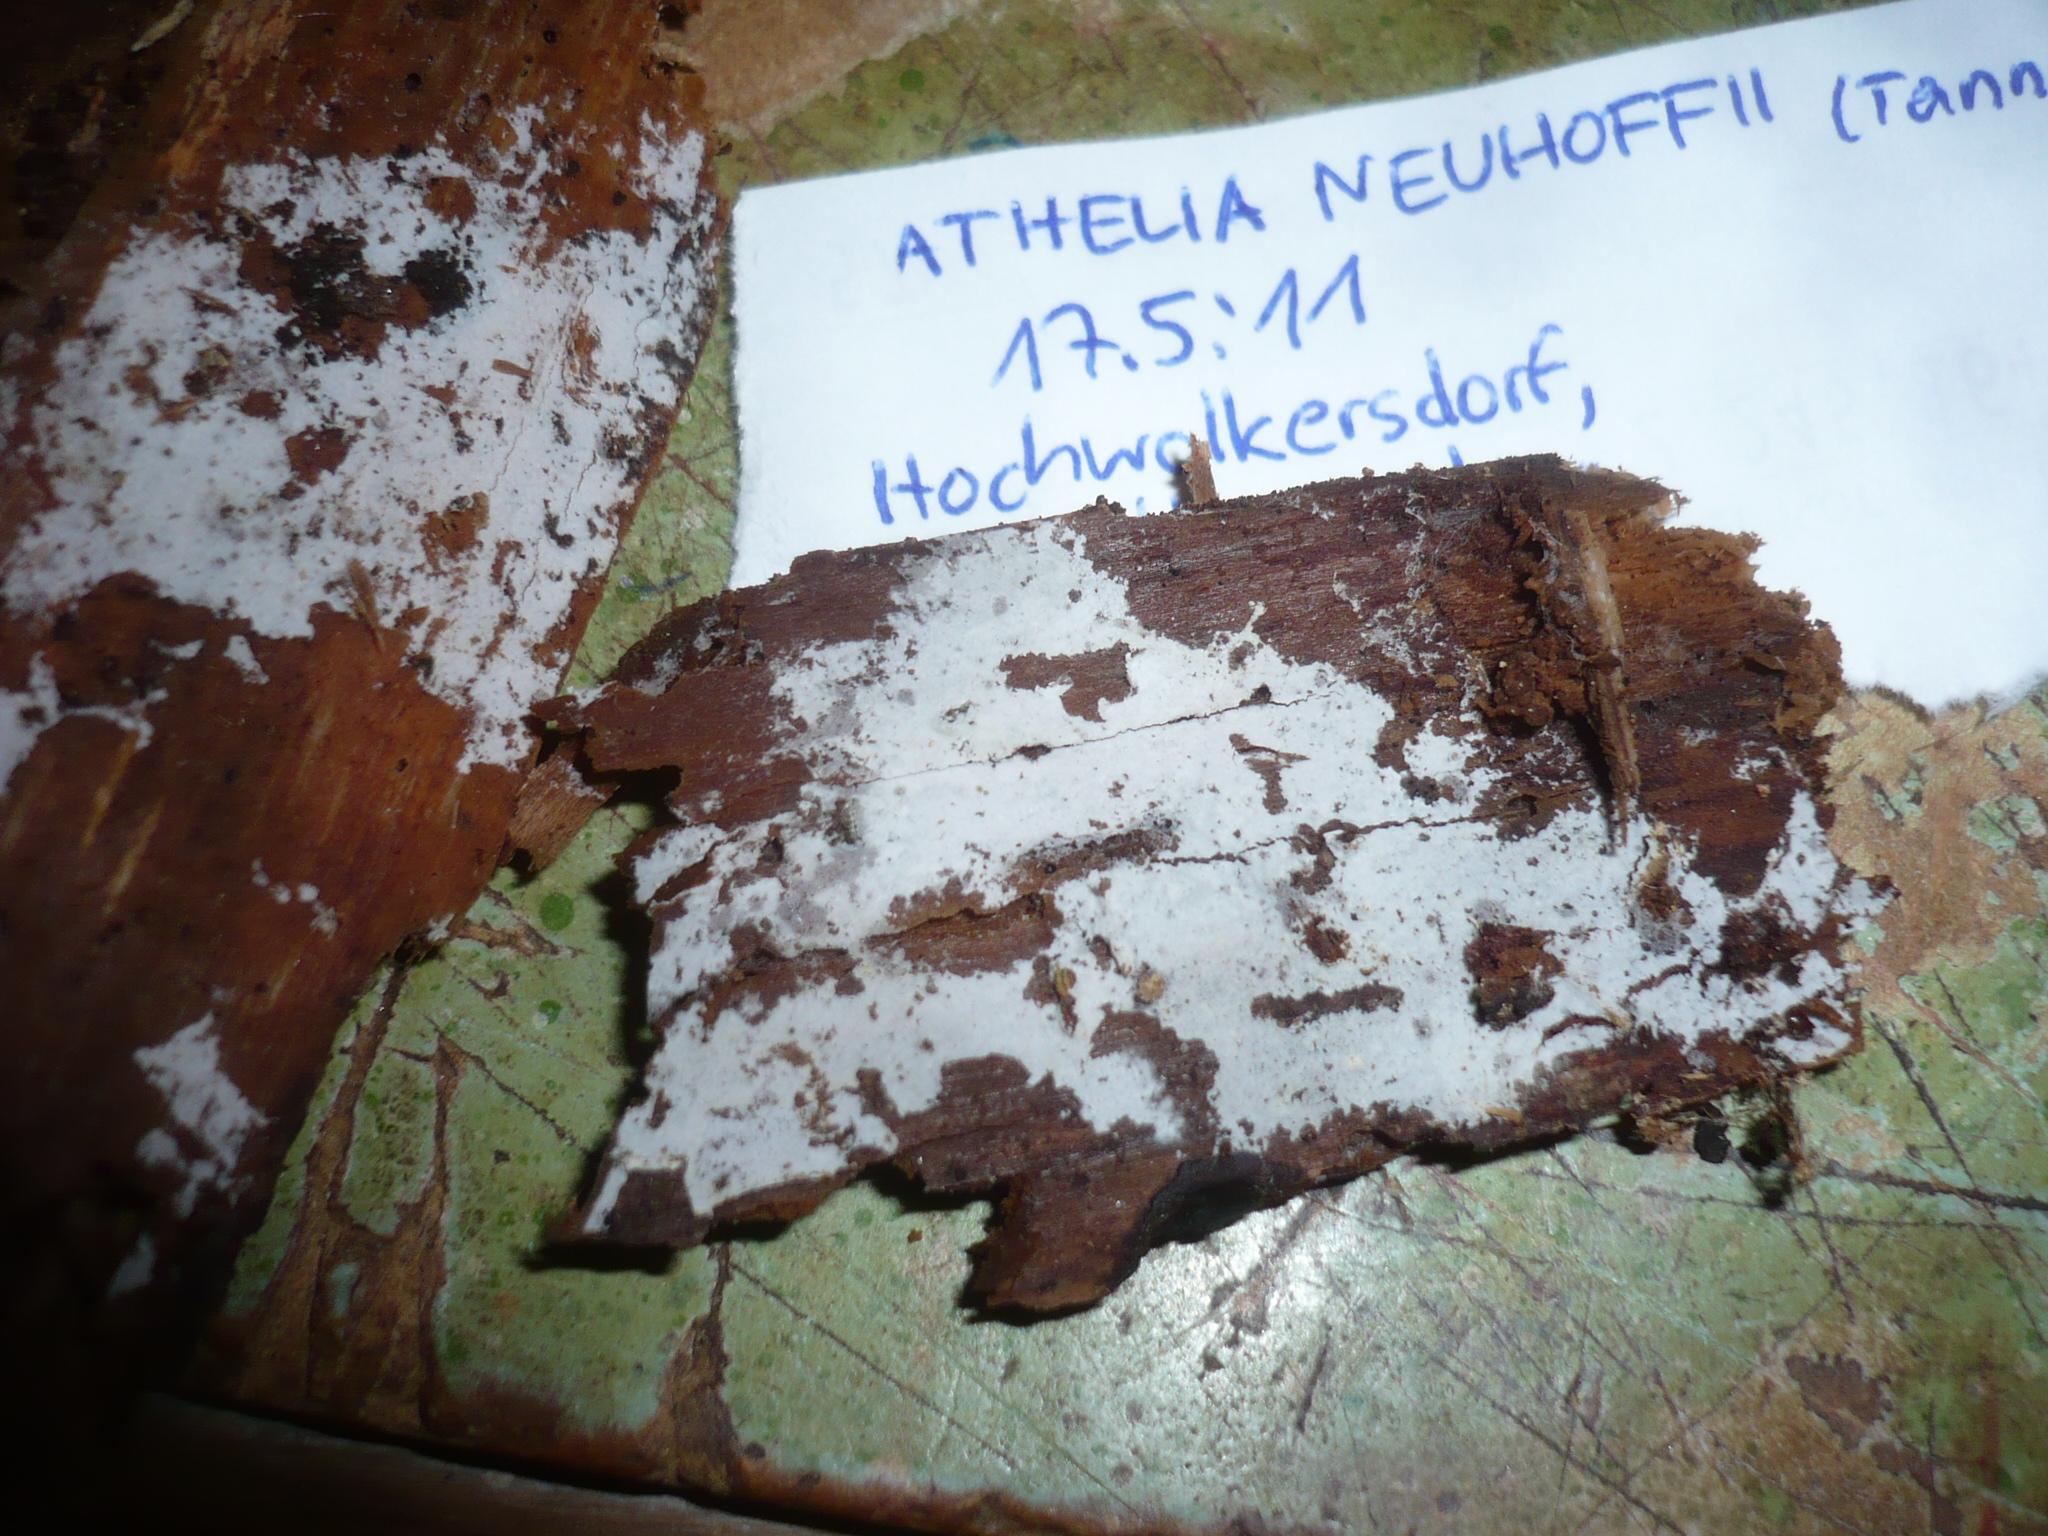 Athelia image